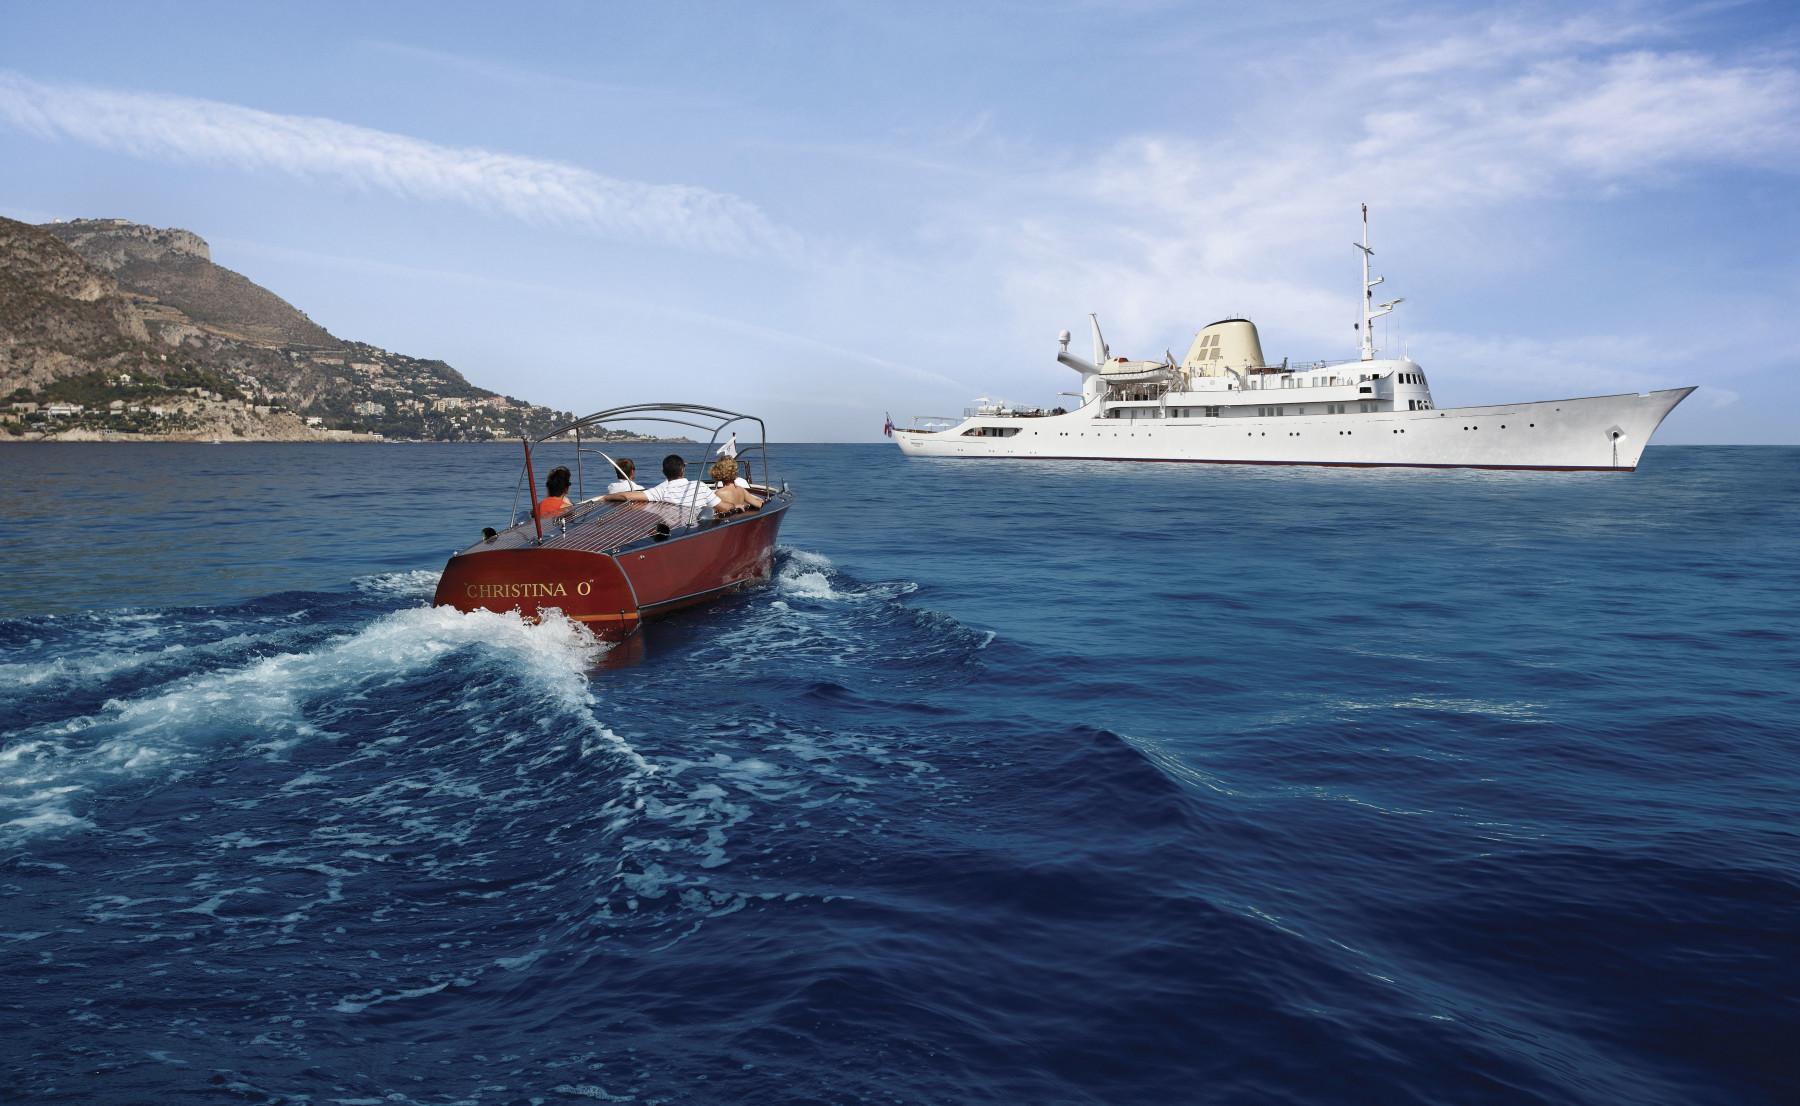 99m-Yacht-CHRISTINA-O-691-158